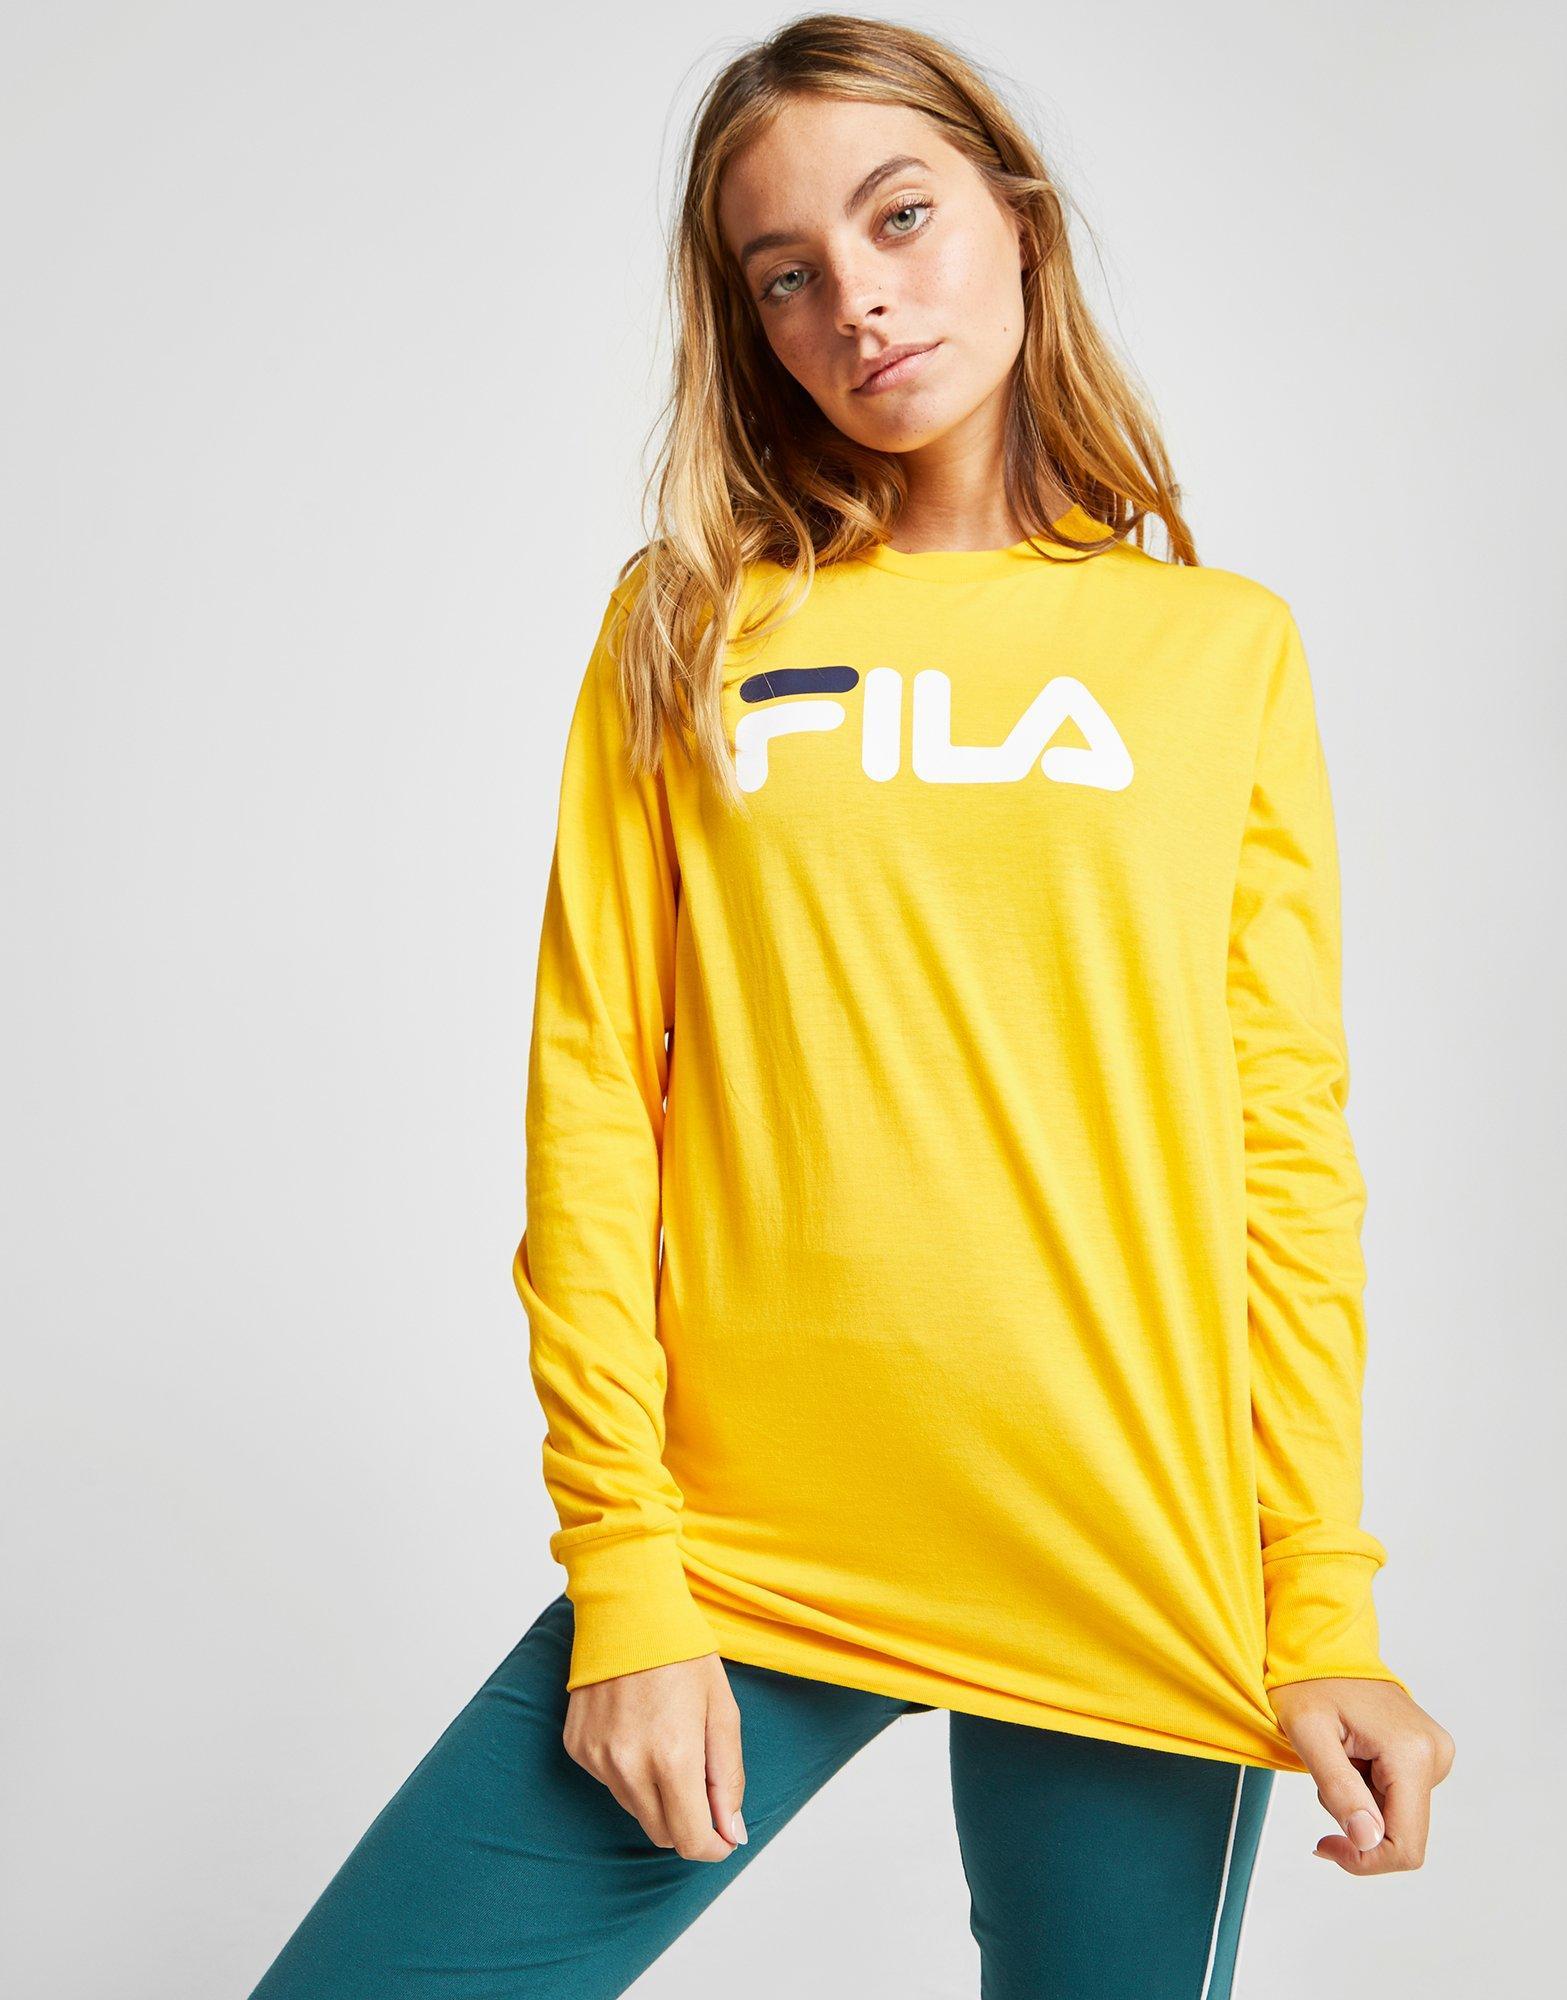 08b7bda9243 Fila Long Sleeve Boyfriend T-shirt in Yellow - Lyst